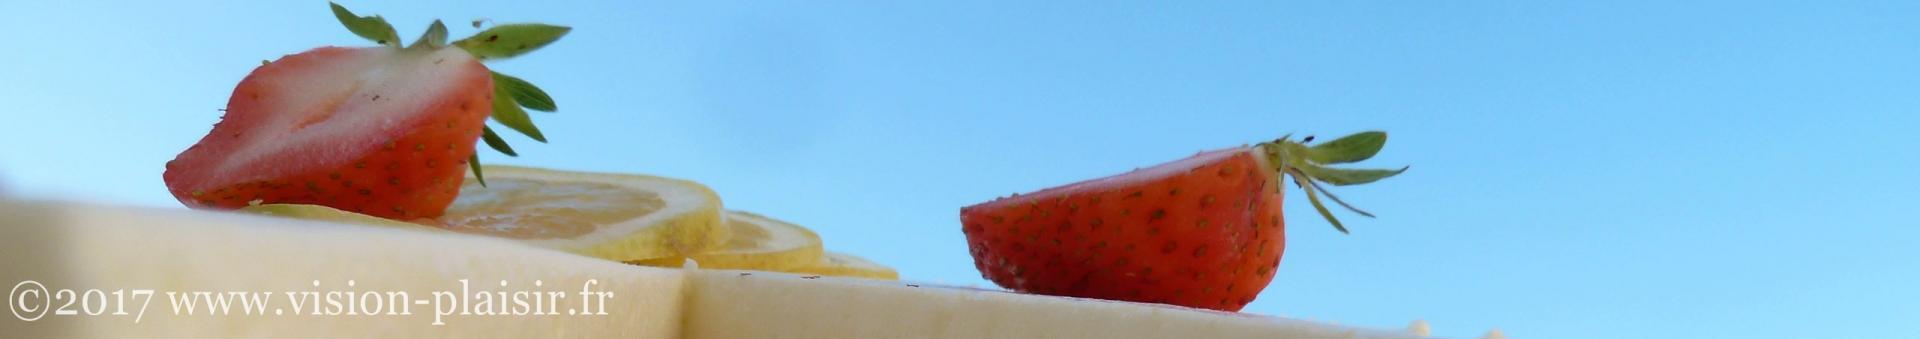 dessert-fromage blanc